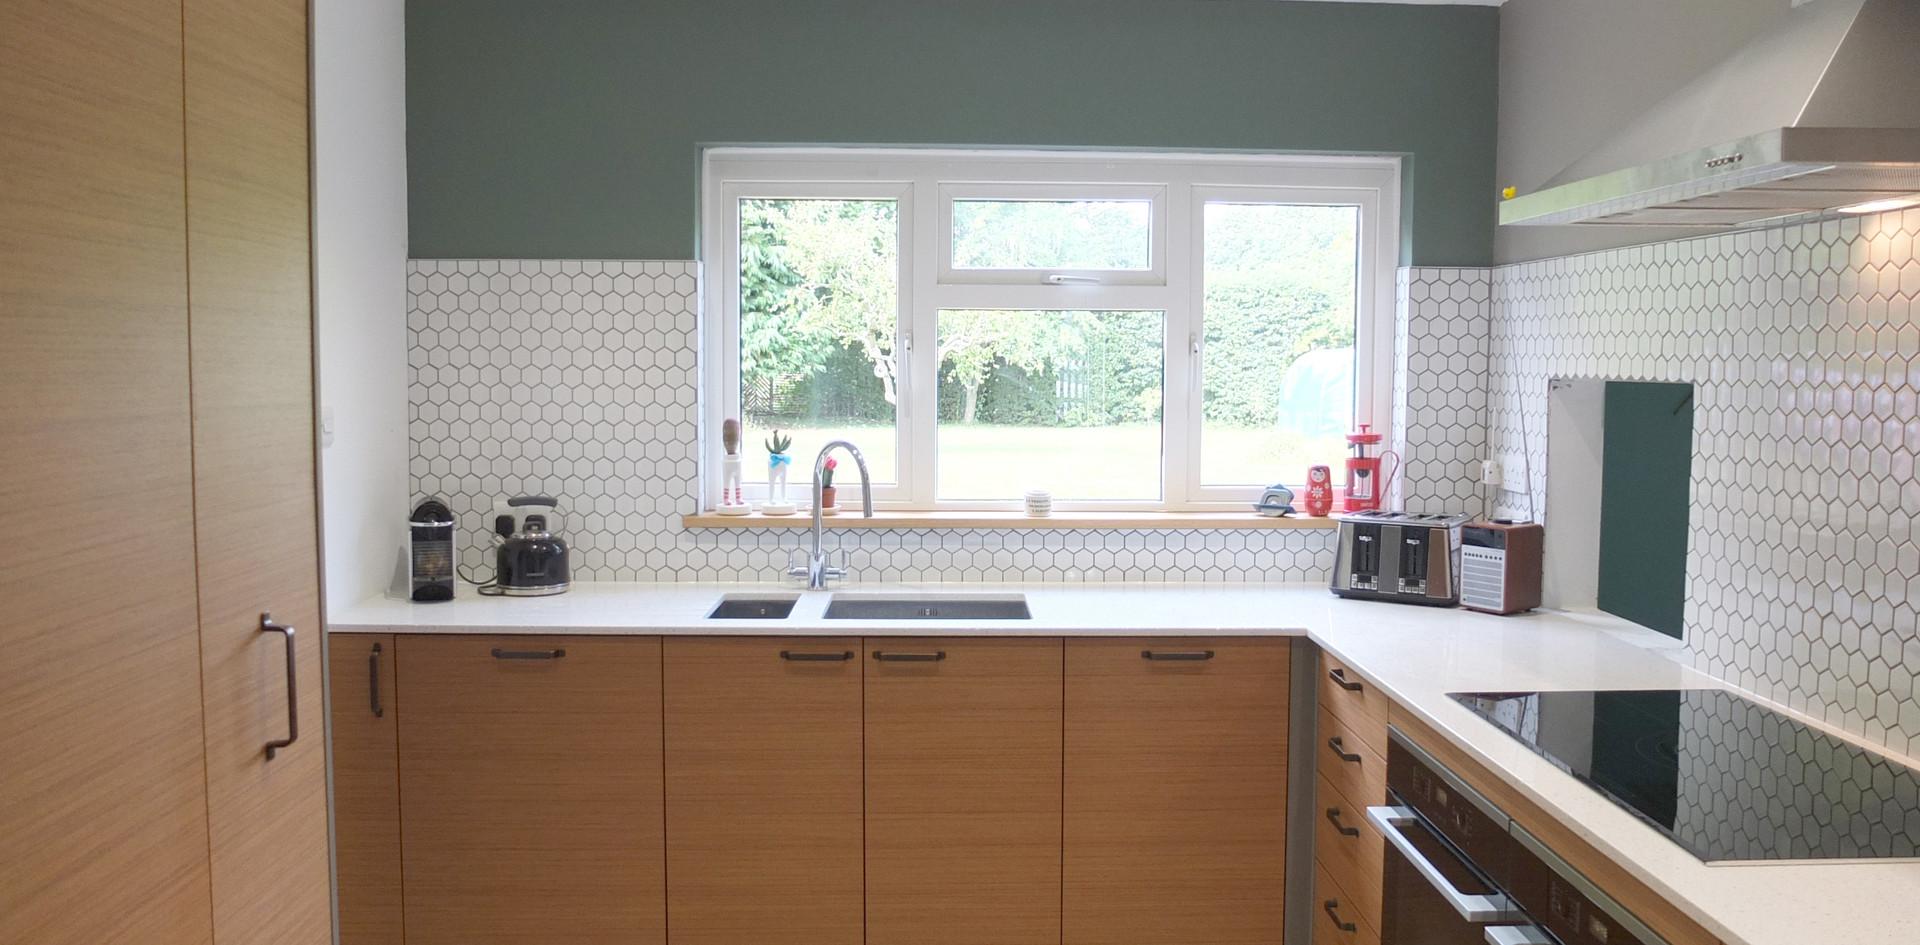 Trufitt Kitchen Severn Road 2